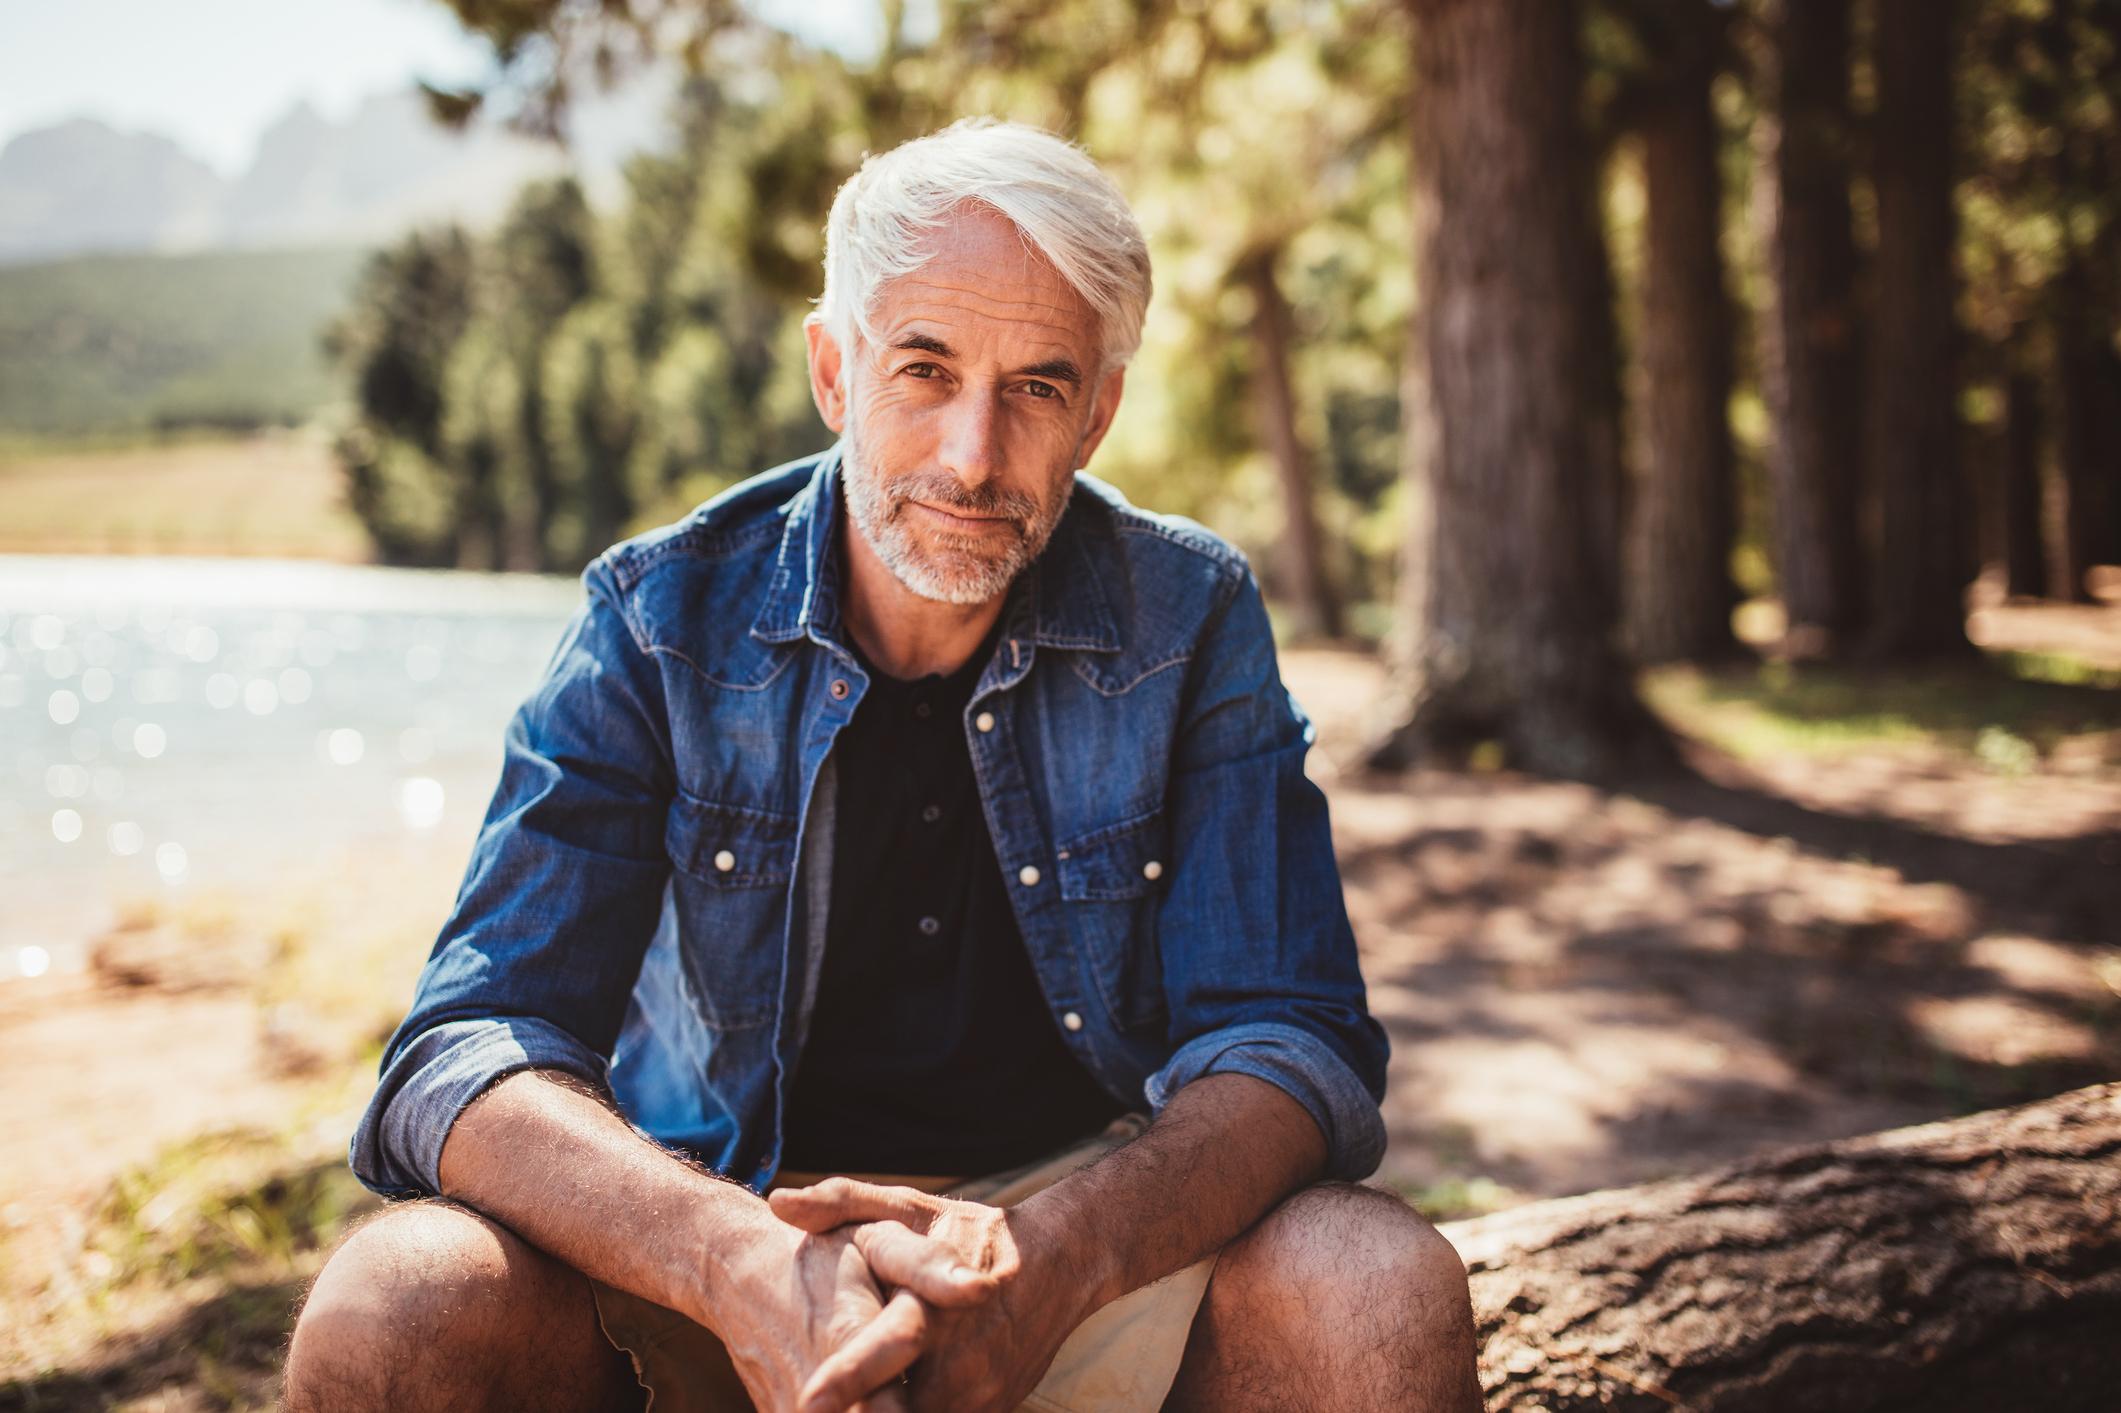 An older man sitting in an outdoor scene.